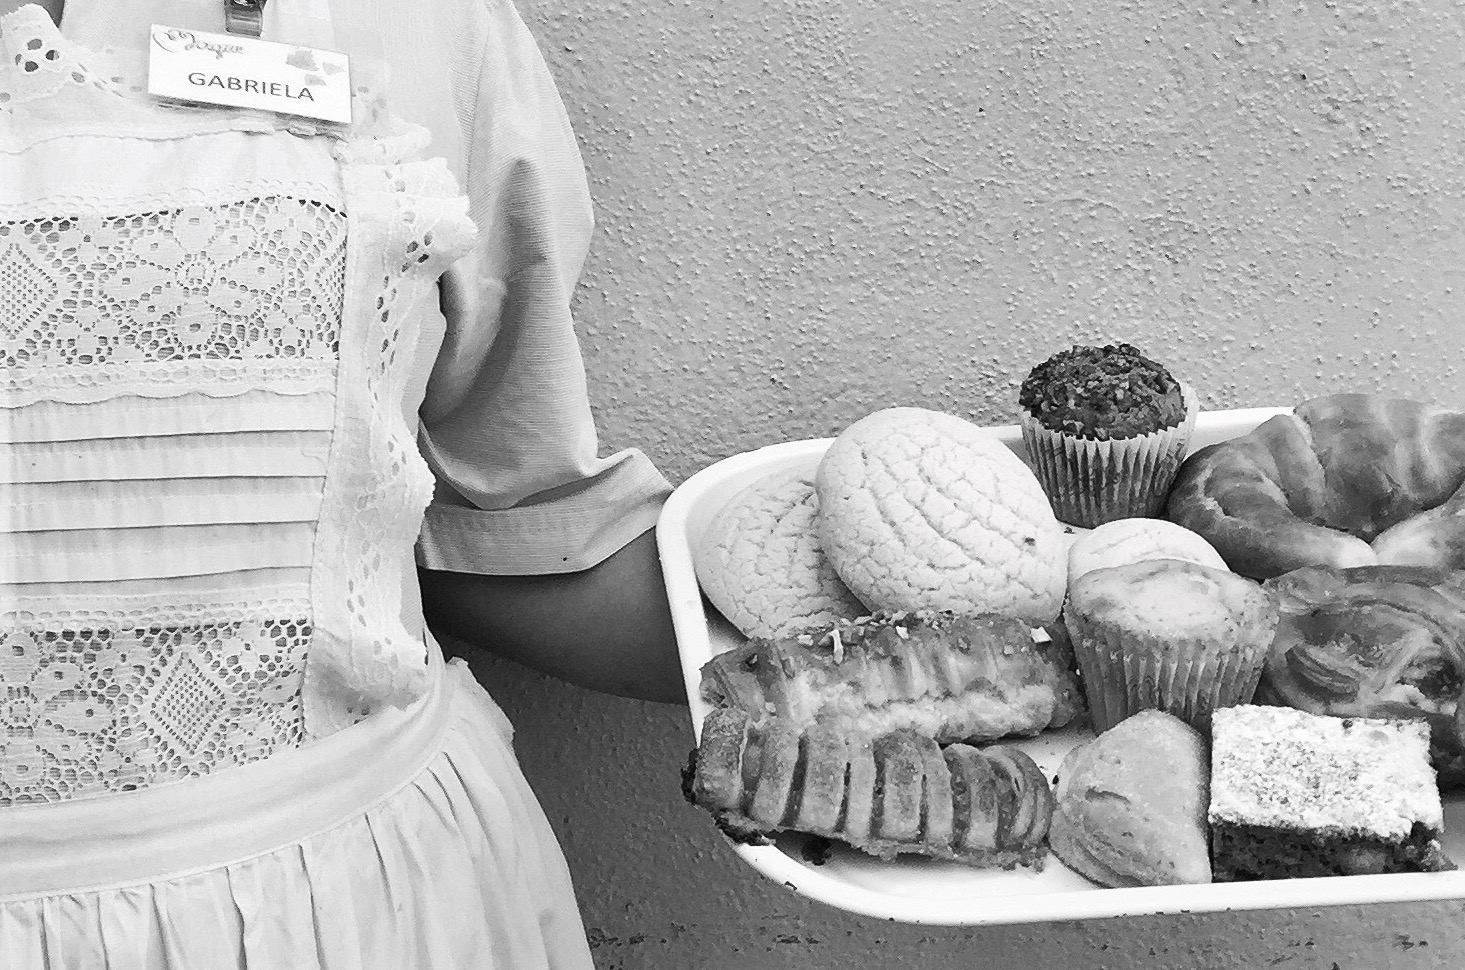 Conchas and cuernitos in Maque's meandering pastry basket.